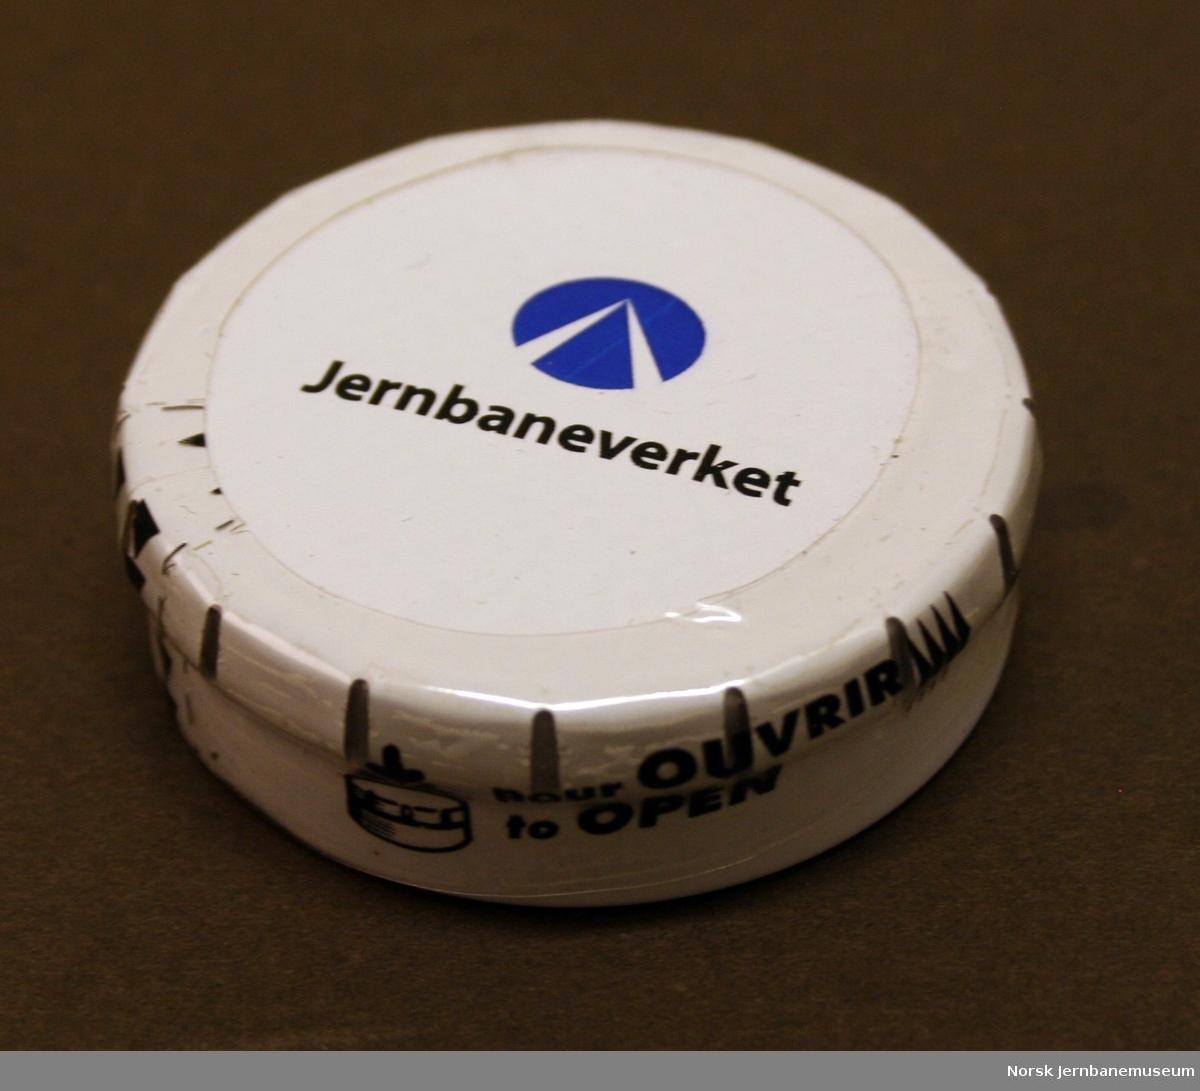 "Rund pastilleske med logo og ""Jernbaneverket"" på lokket"